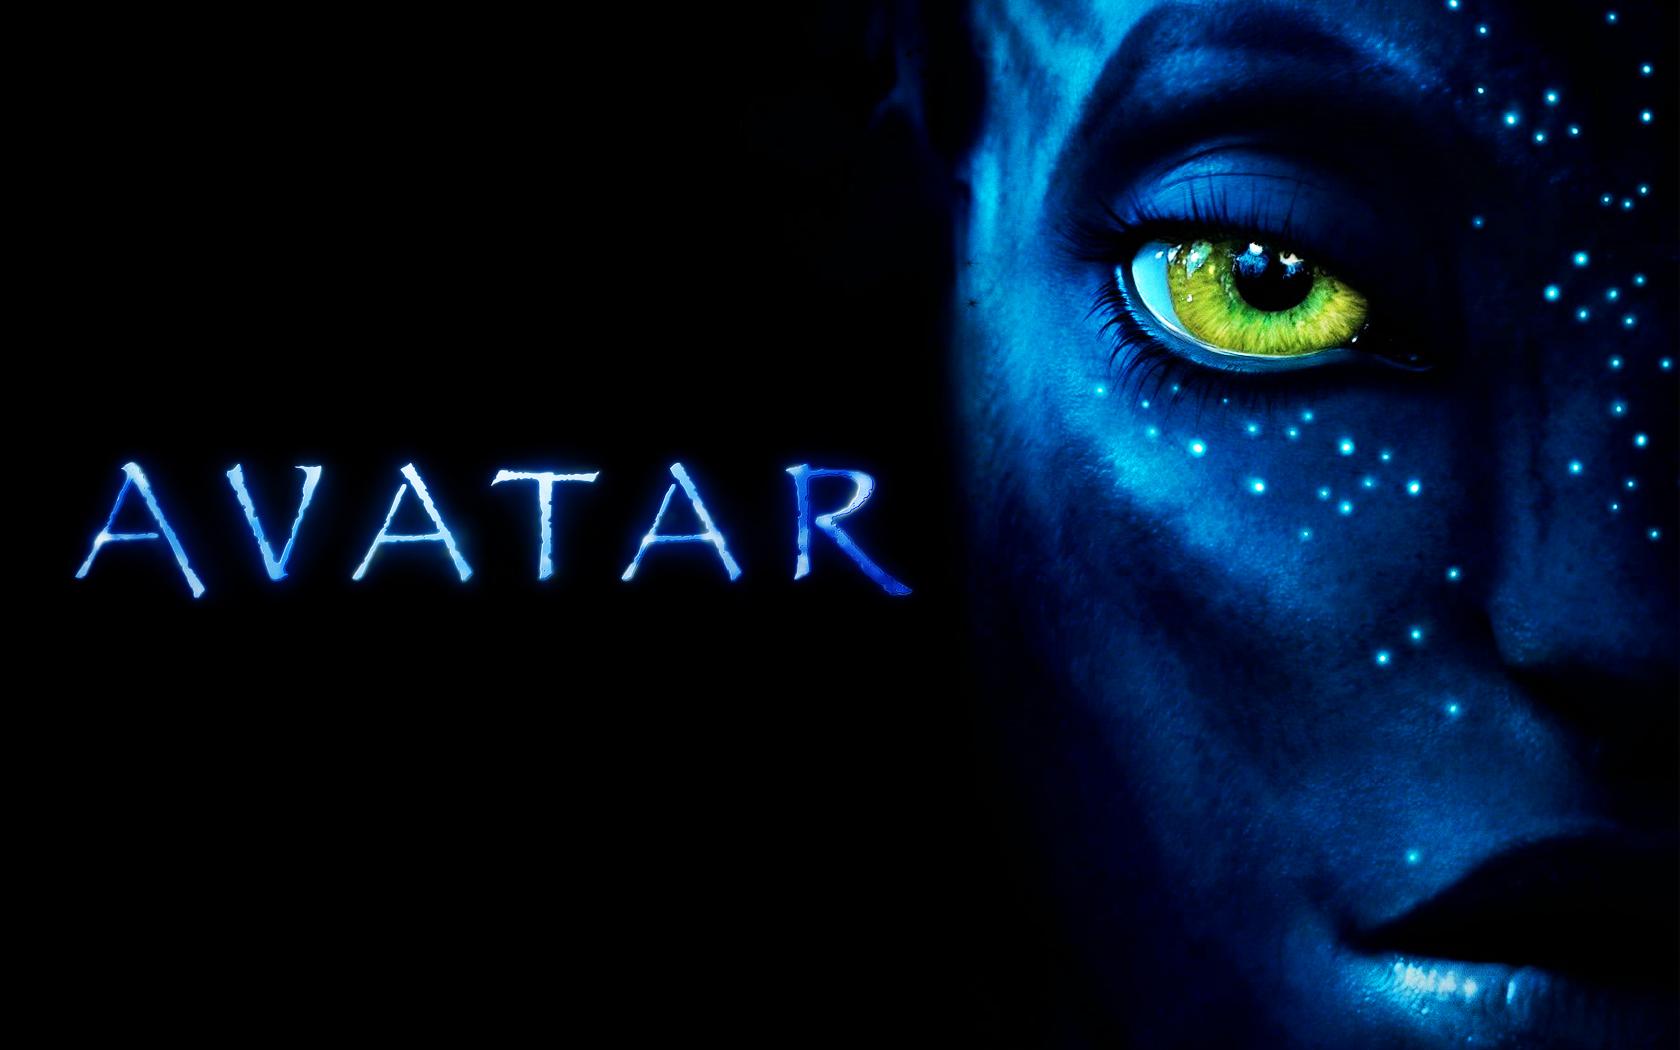 Avatar HD Wallpaper 12 2560